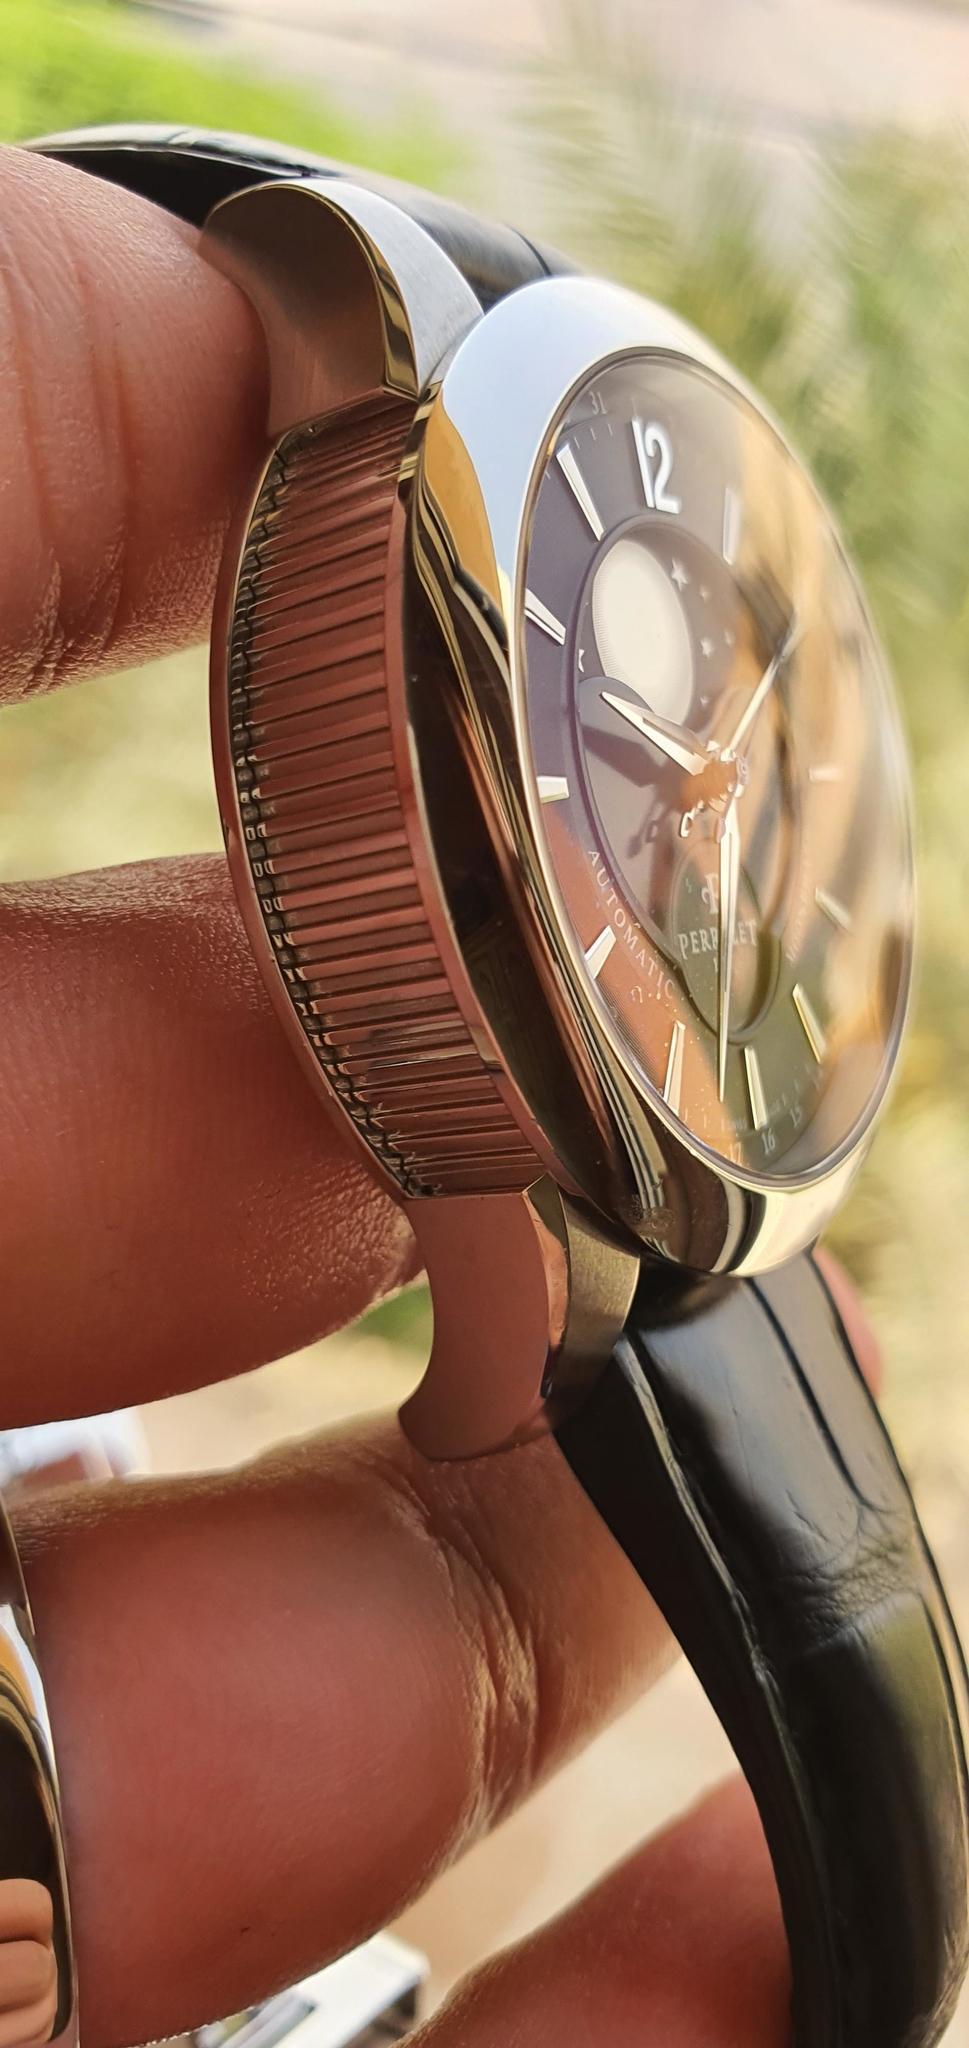 Perrelet Moonphase Men's Watch Model A1039.7 (QAR